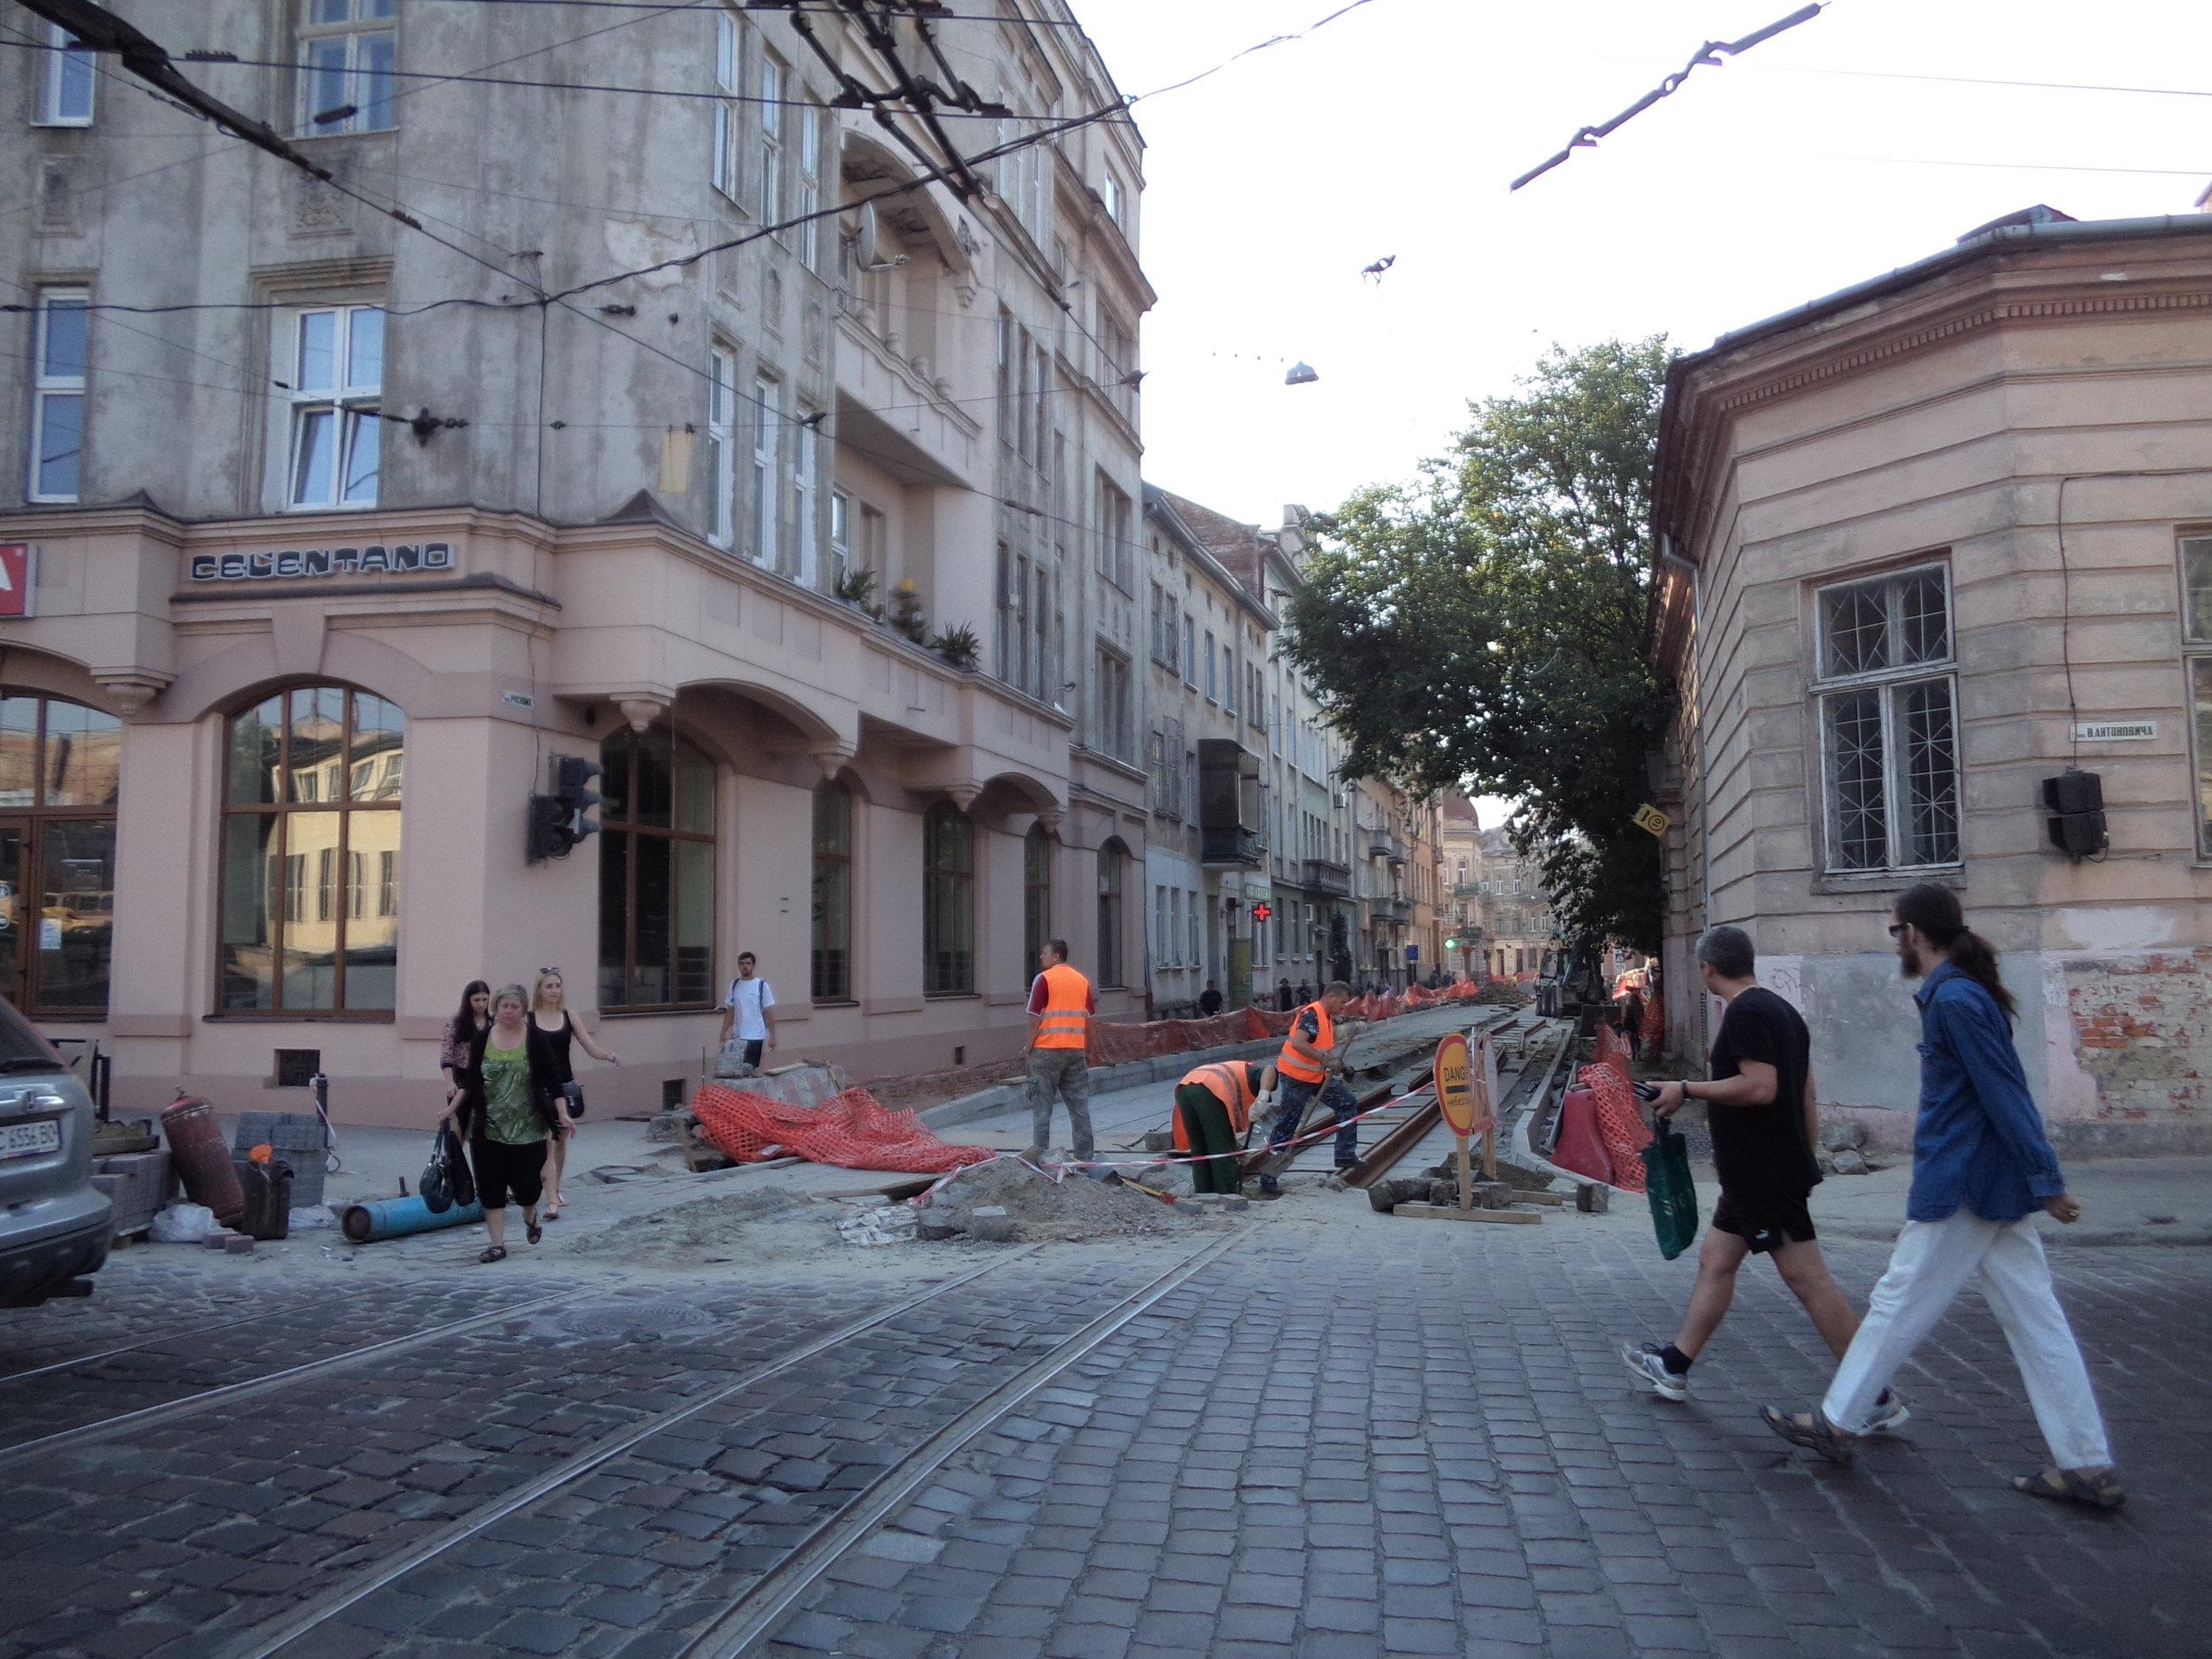 Ulice Rusovych.